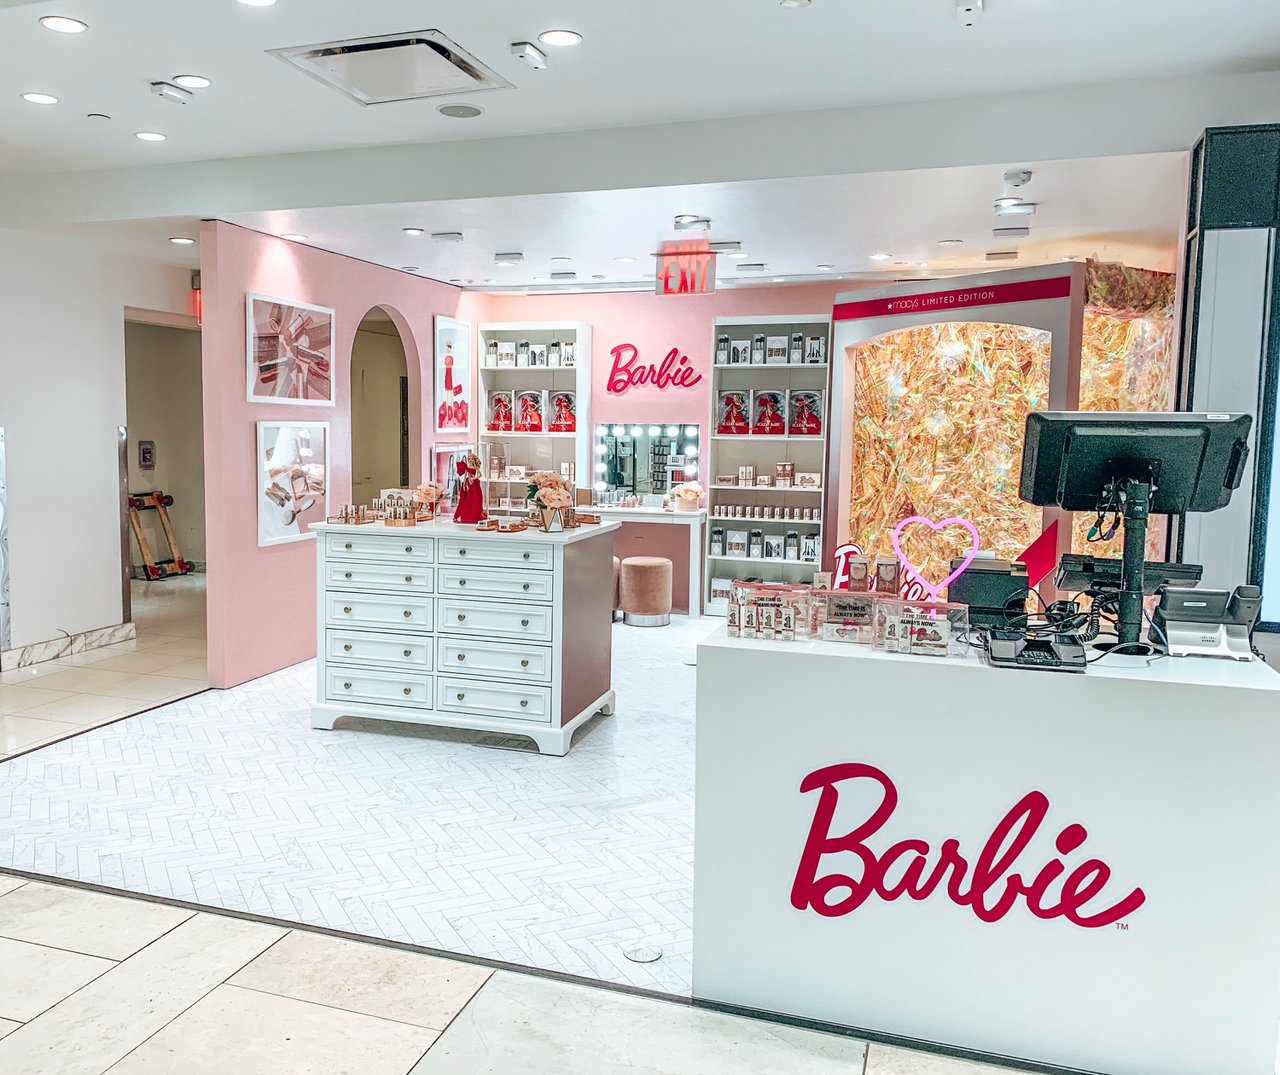 Macy's  Barbie x PUR Cosmetics  photo IMG_2152.jpg